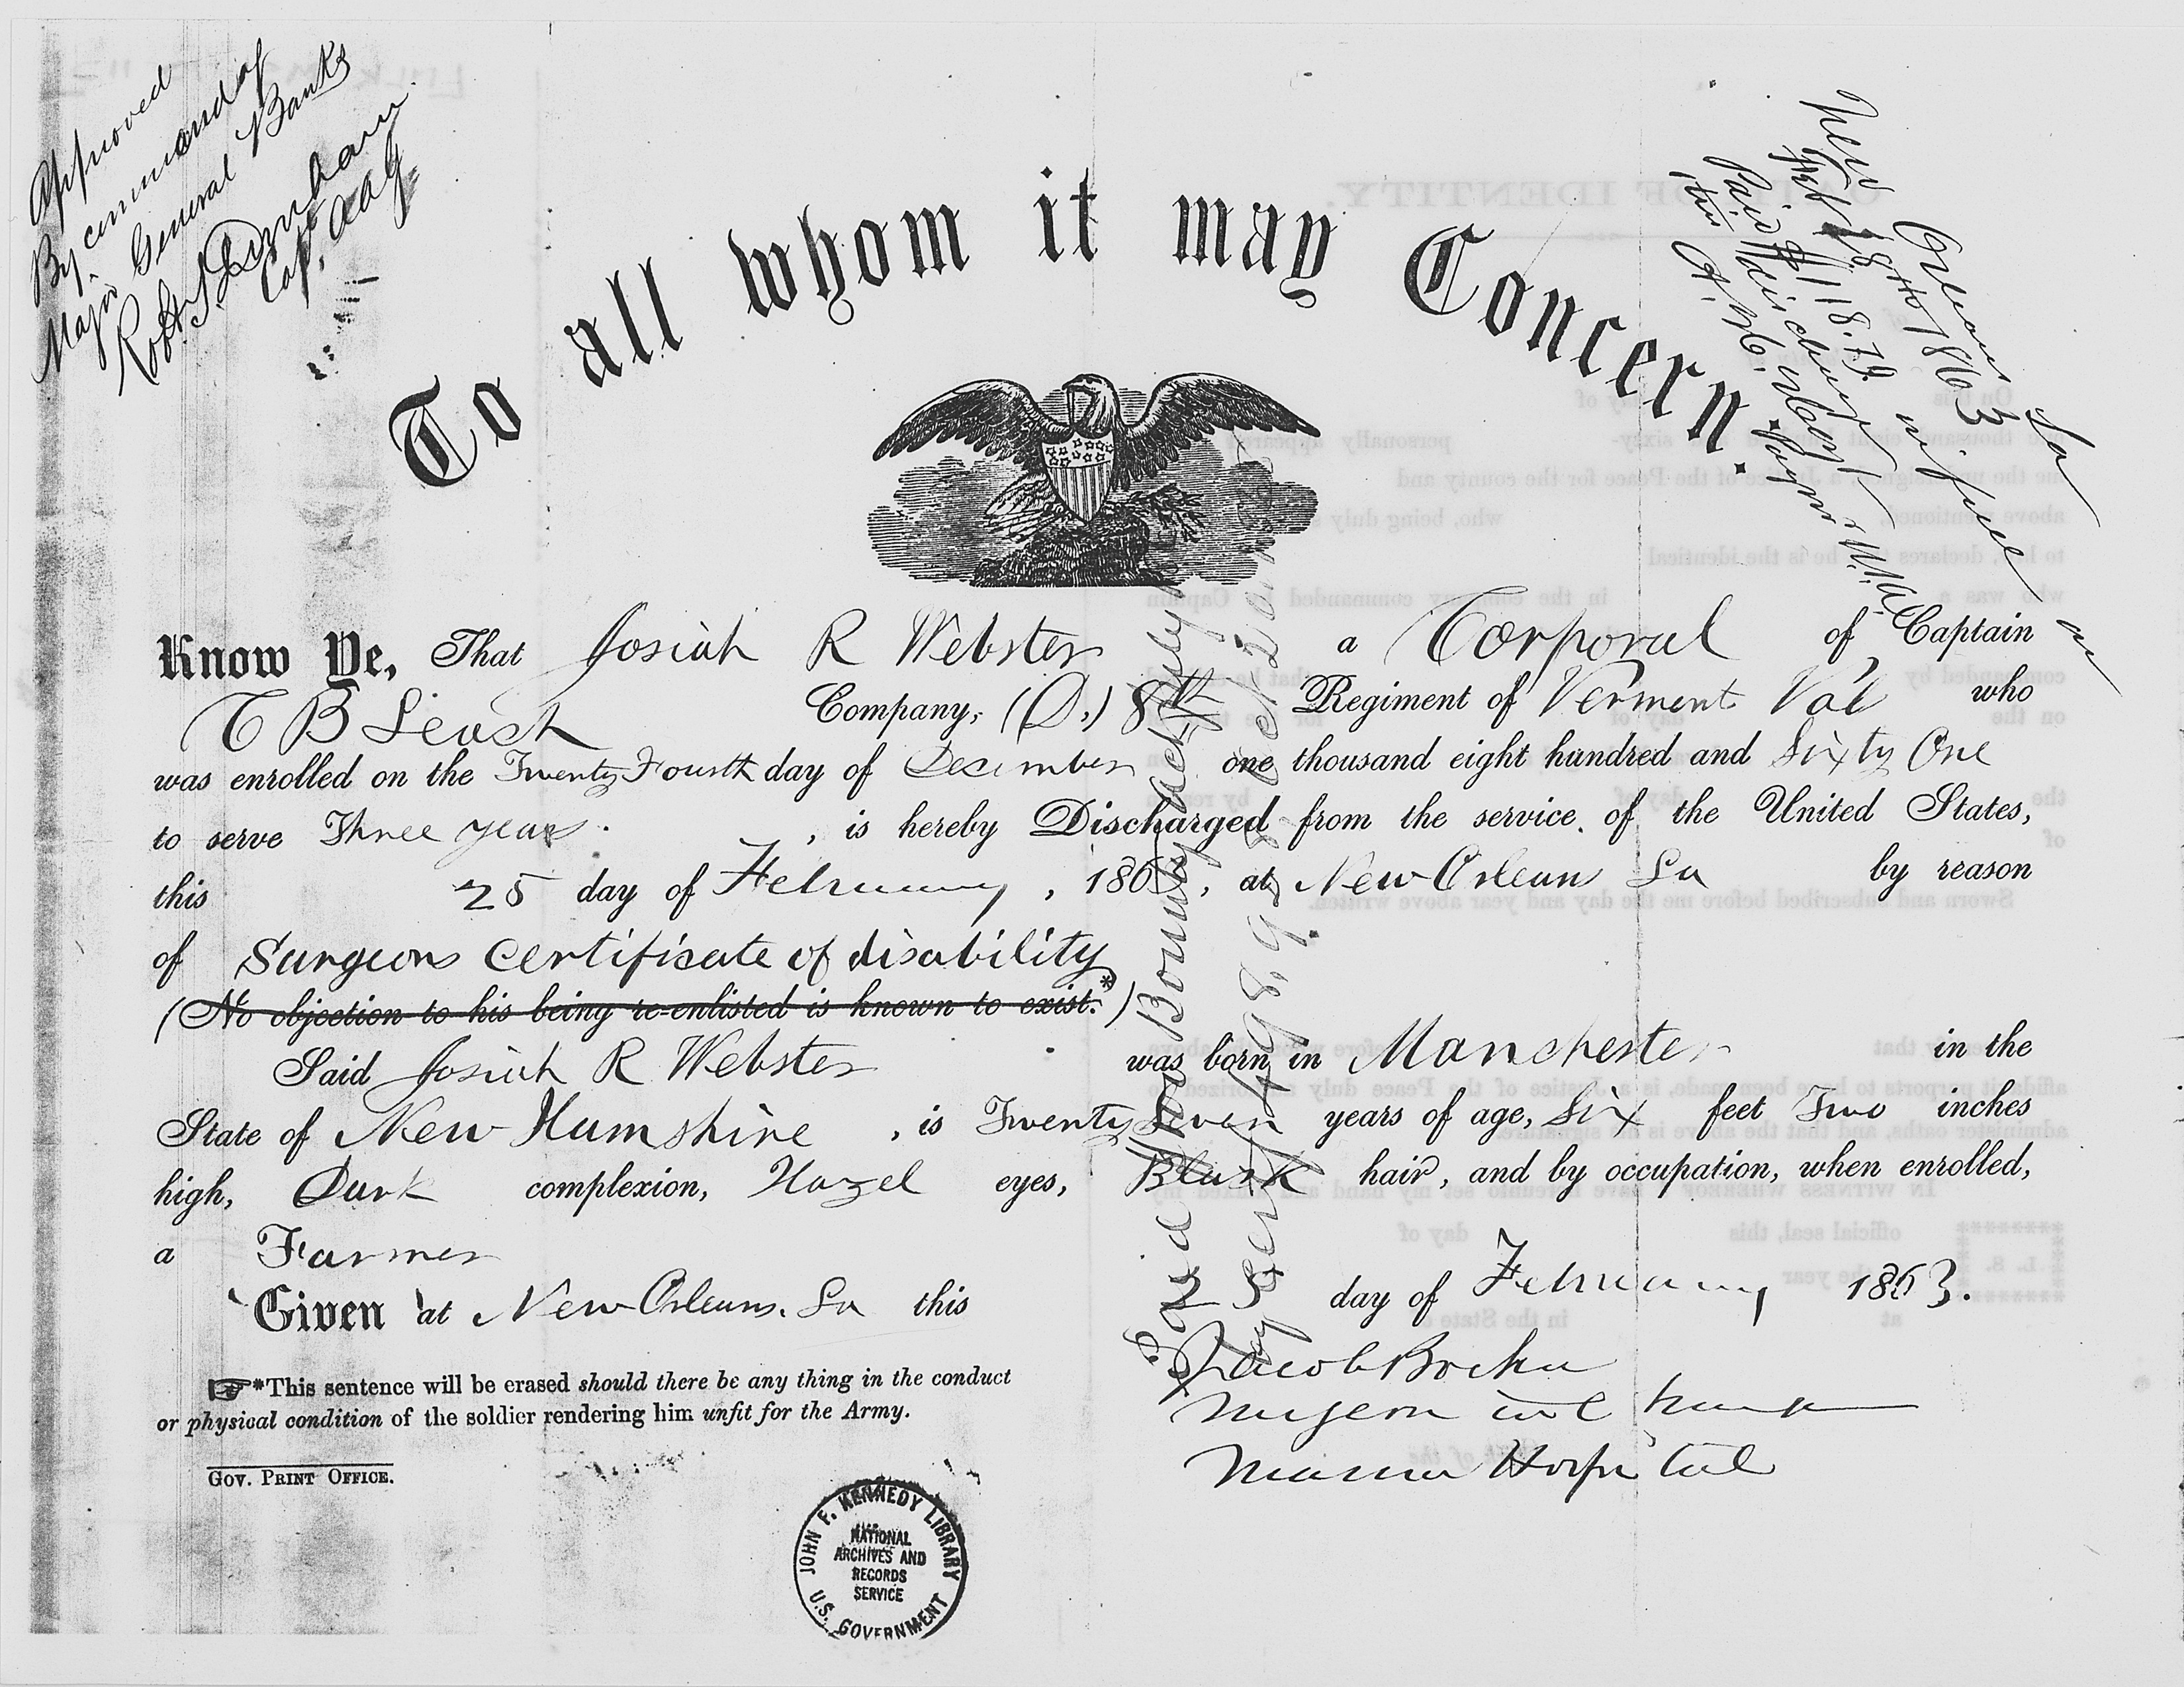 File:Josiah Webster Civil War Discharge Certificate